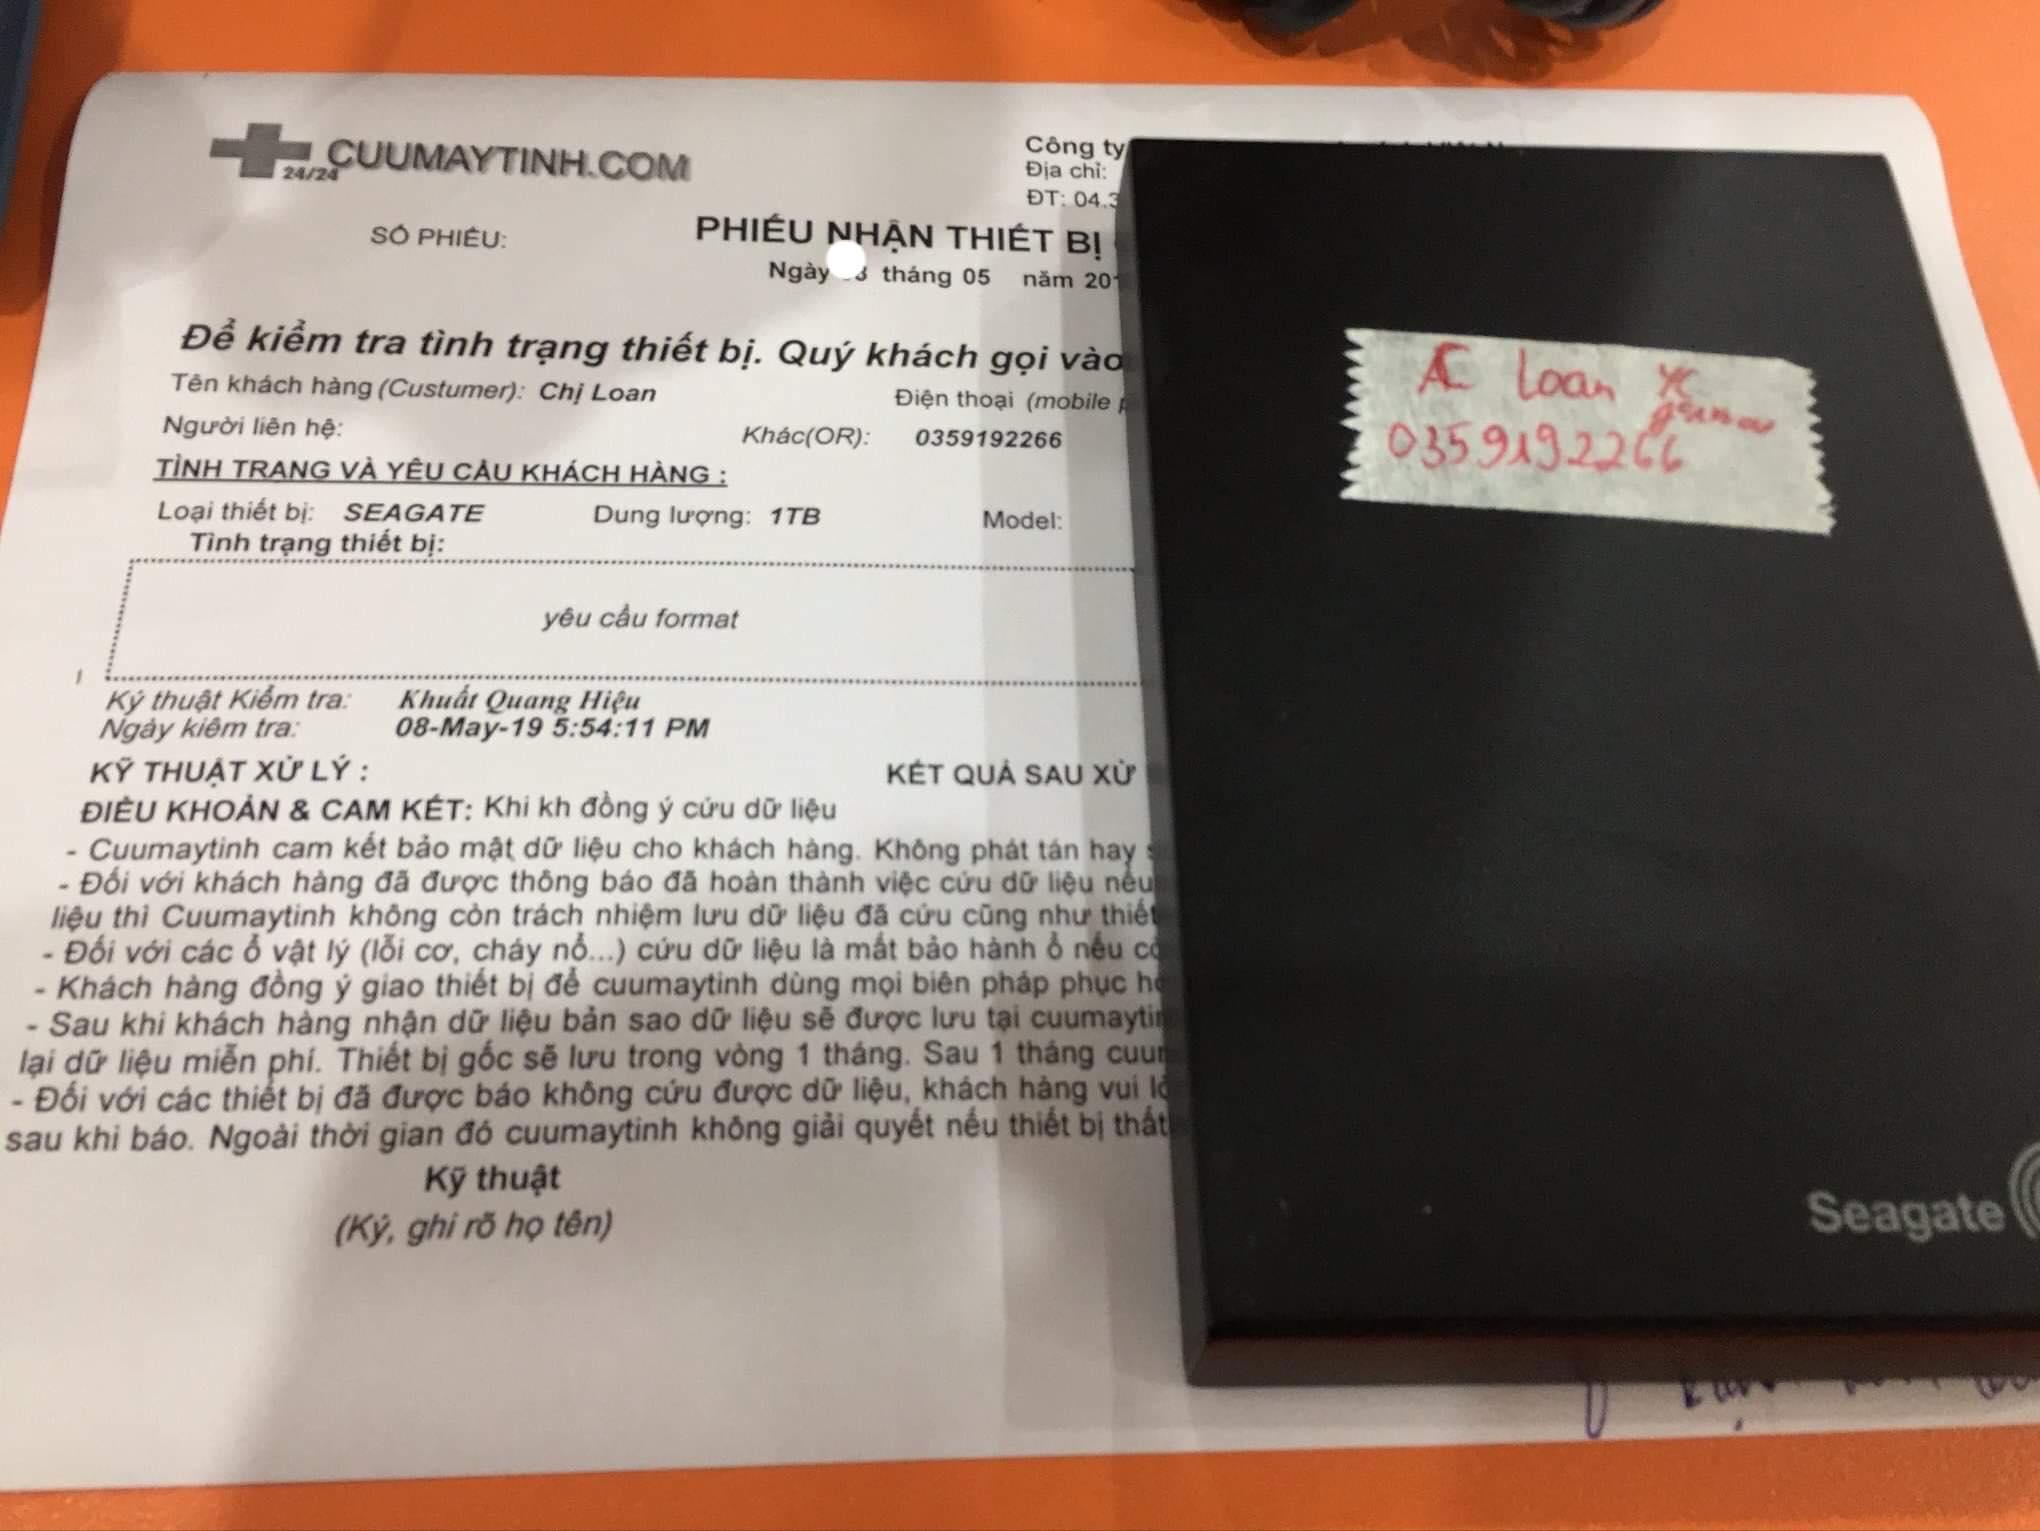 Lấy dữ liệu ổ cứng Seagate 1TB yêu cầu format 22/05/2019 - cuumaytinh